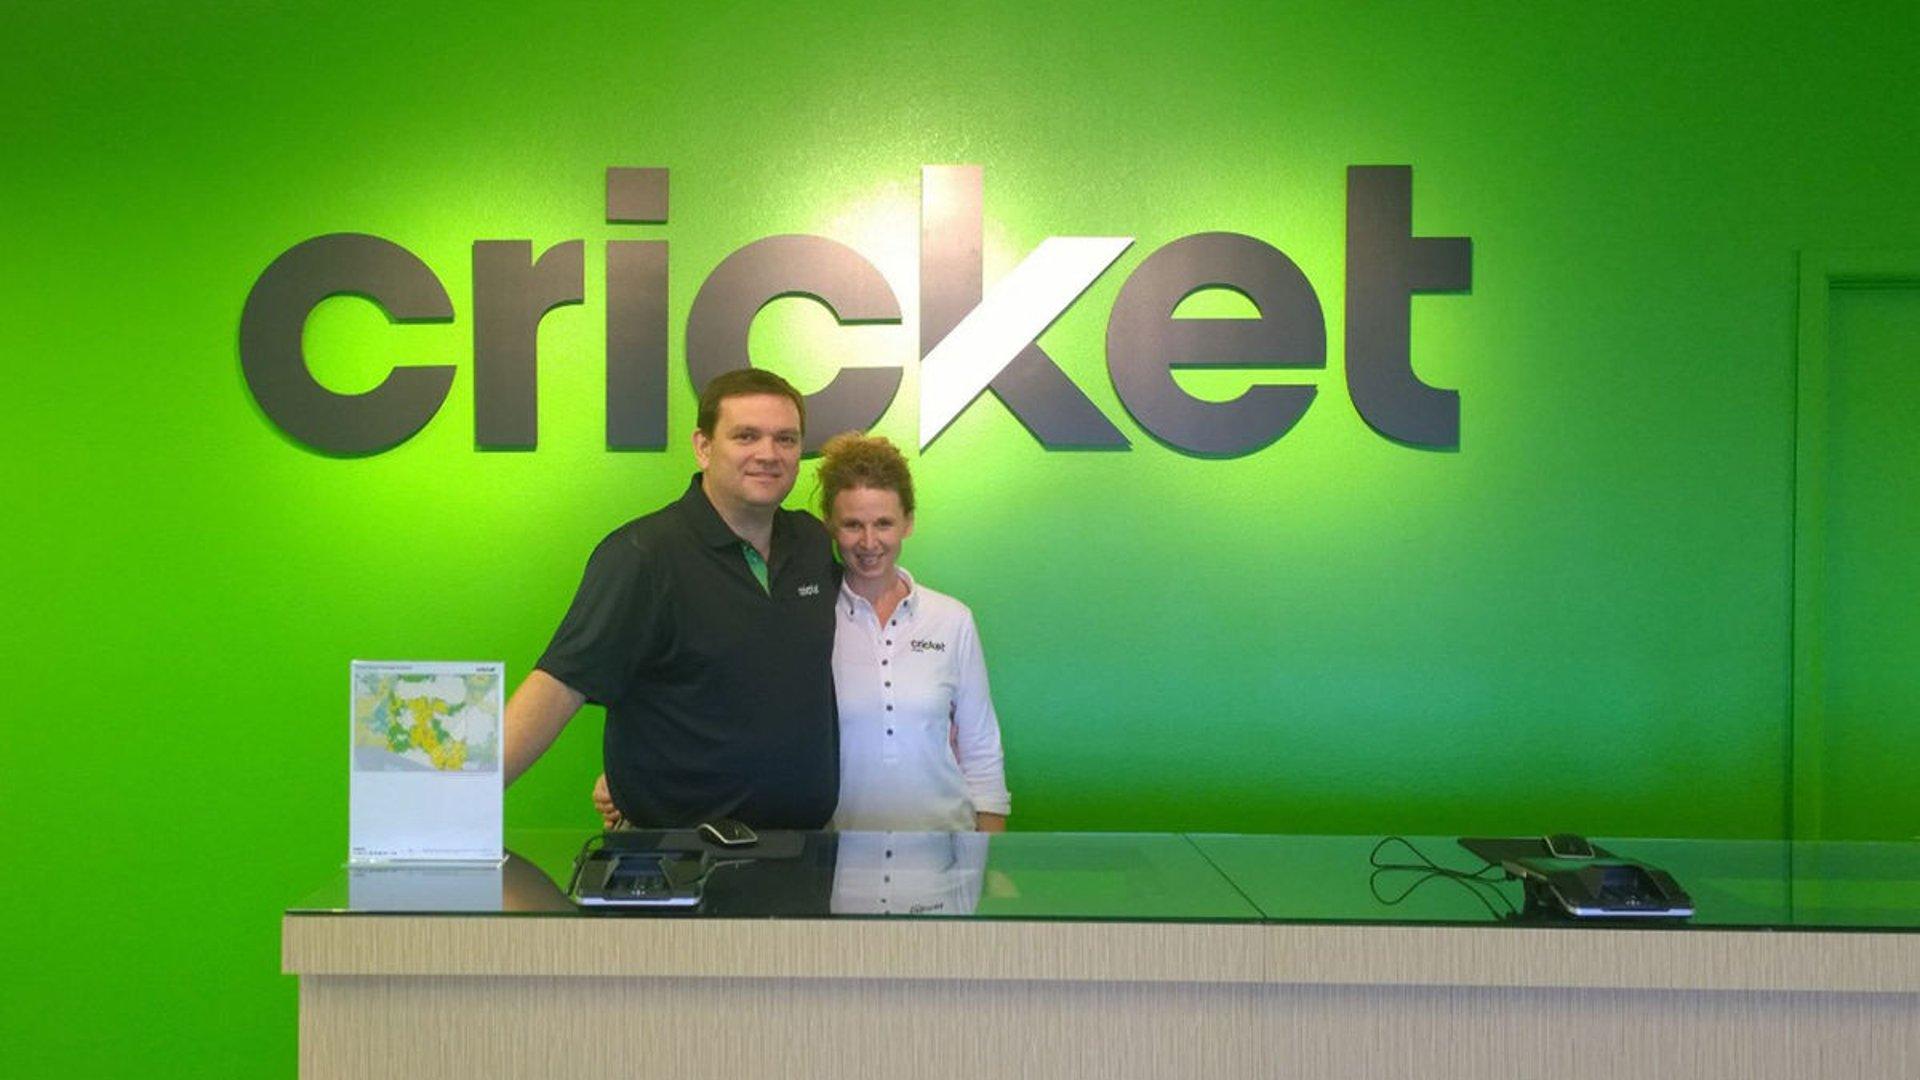 Cricket Wireless - Logo